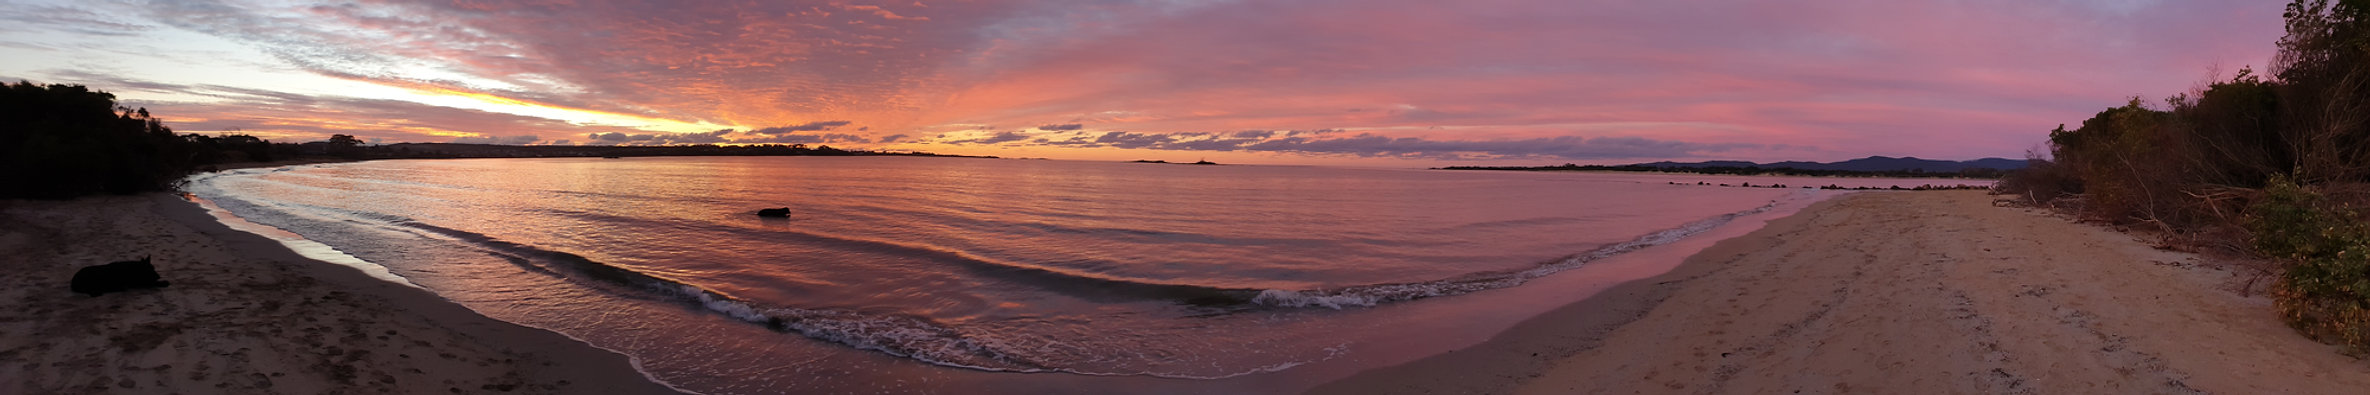 sunset beach wedding tasmania